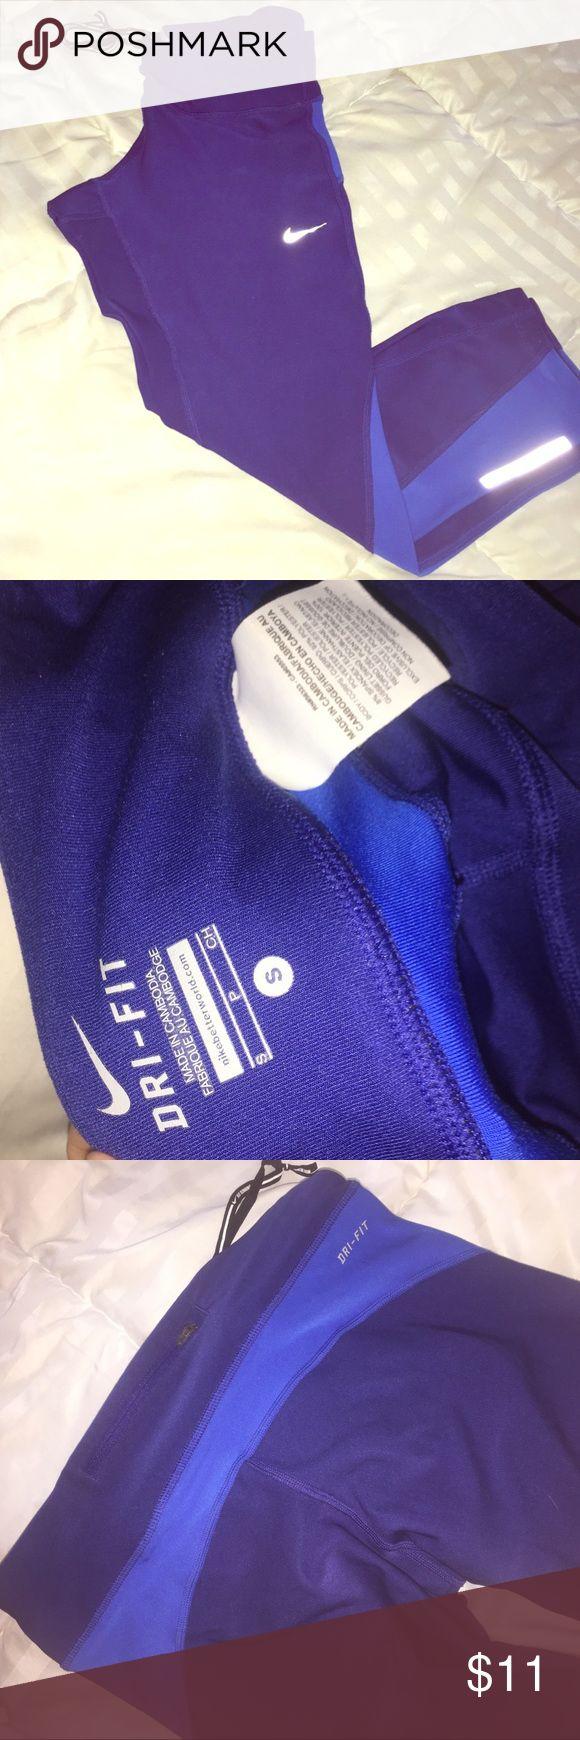 Nike Capri leggings Capri Nike leggings worn about once or twice in good condition!! Nike Pants Leggings